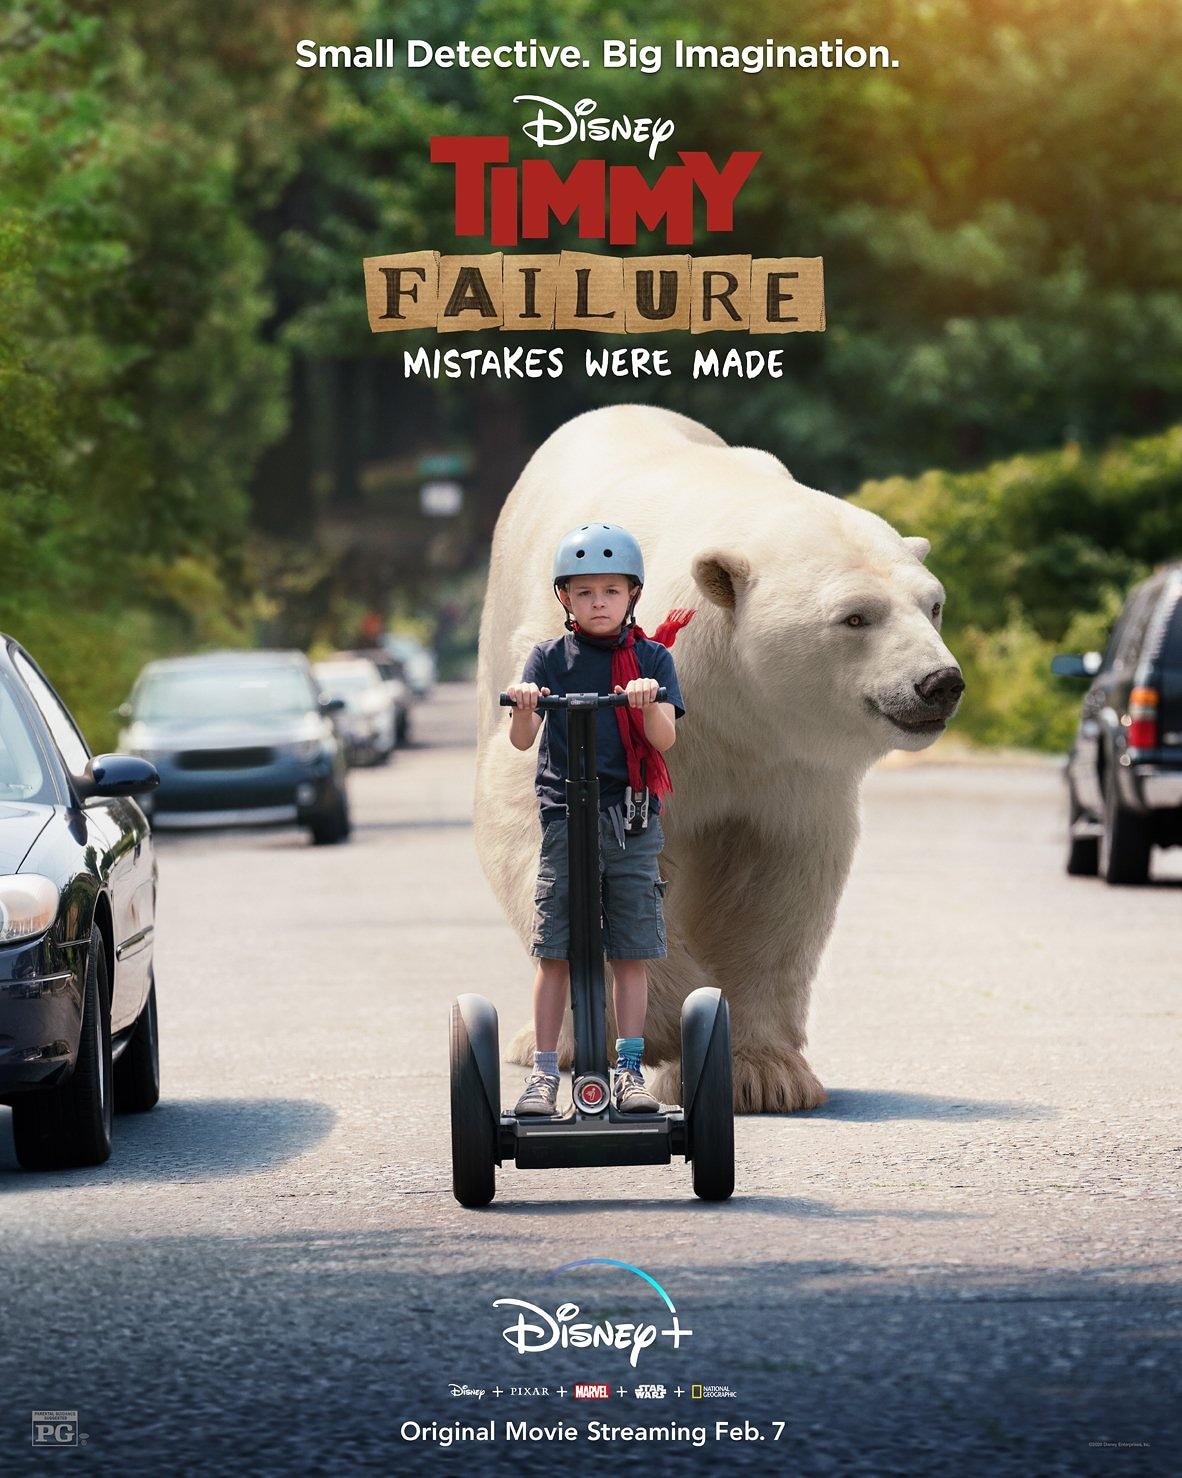 Timmy Failure: Mistakes Were Made [Disney - 2020] ENsR9gVWwAEyyE3?format=jpg&name=large